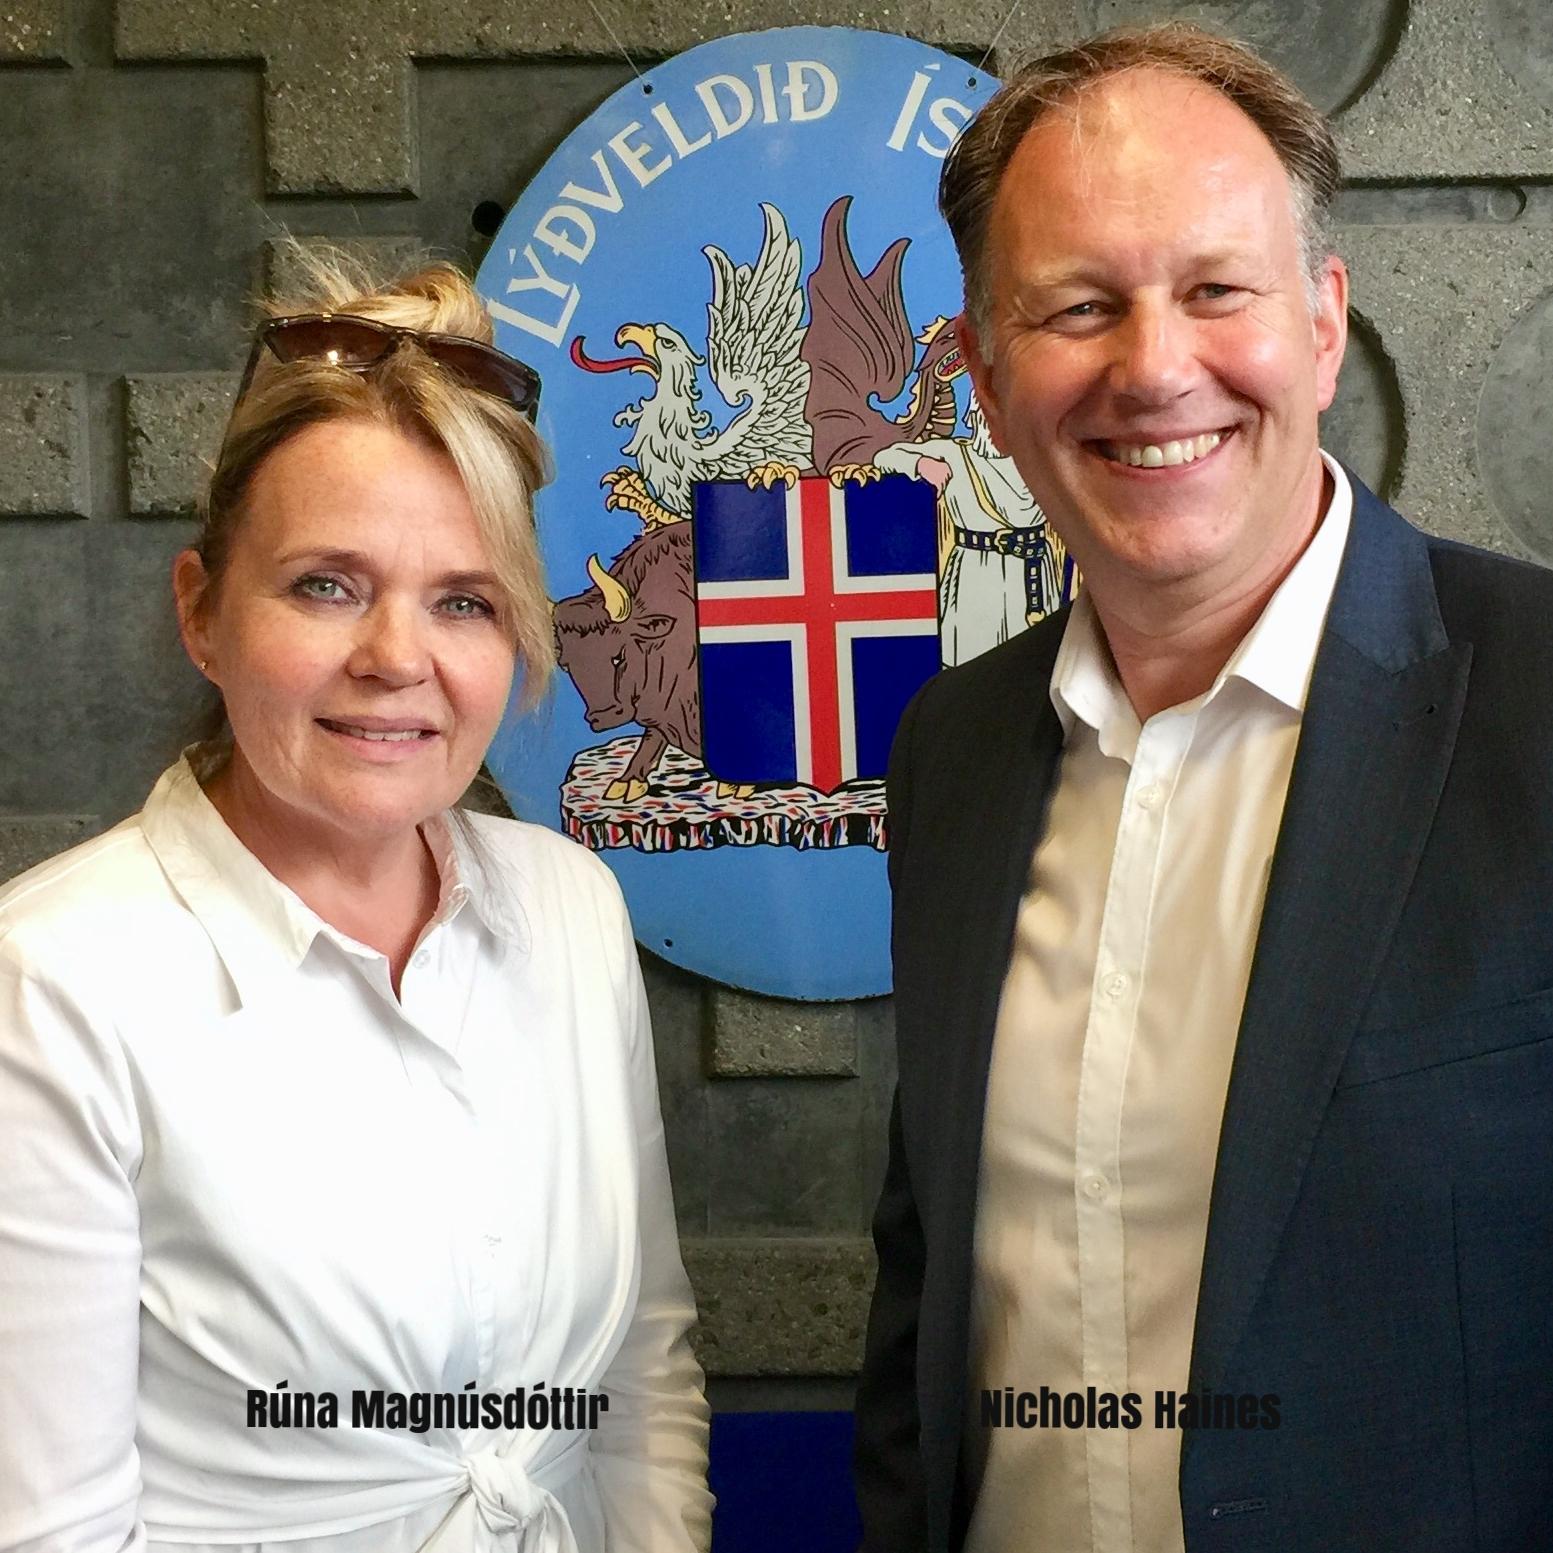 Rúna Magnús & Nicholas Haines Icelandic Embassy